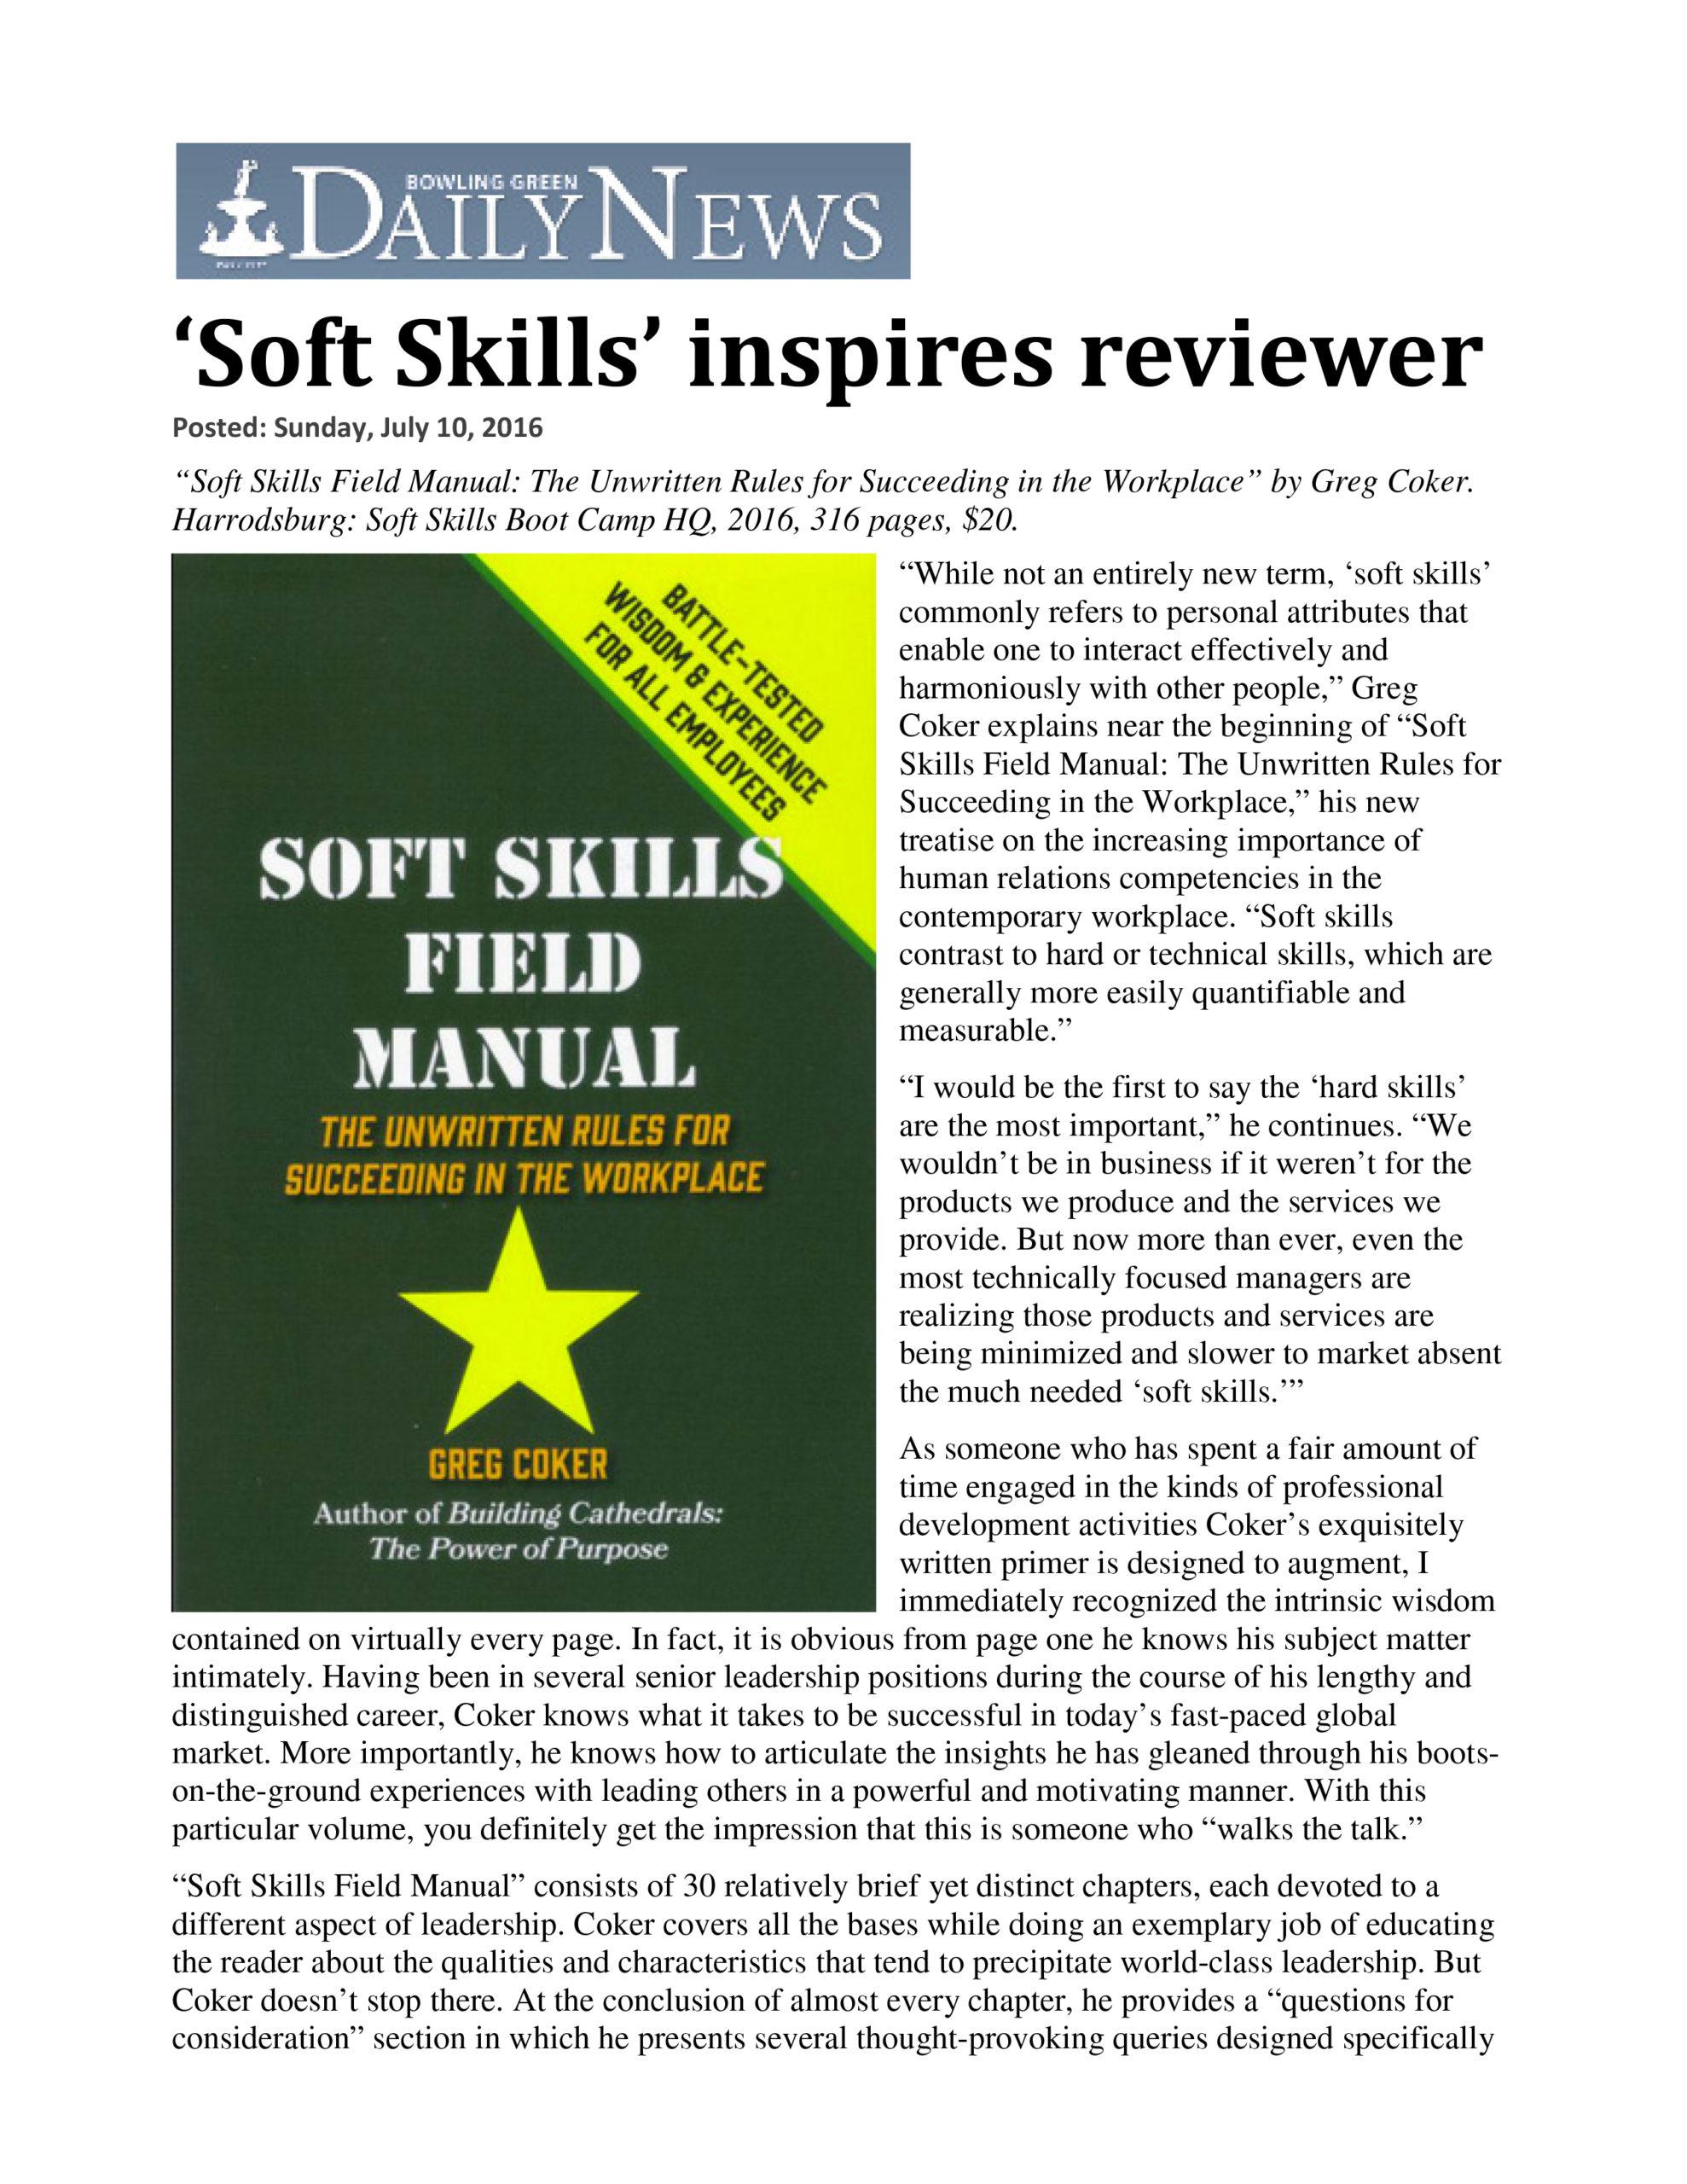 Praise for Soft Skills Bootcamp